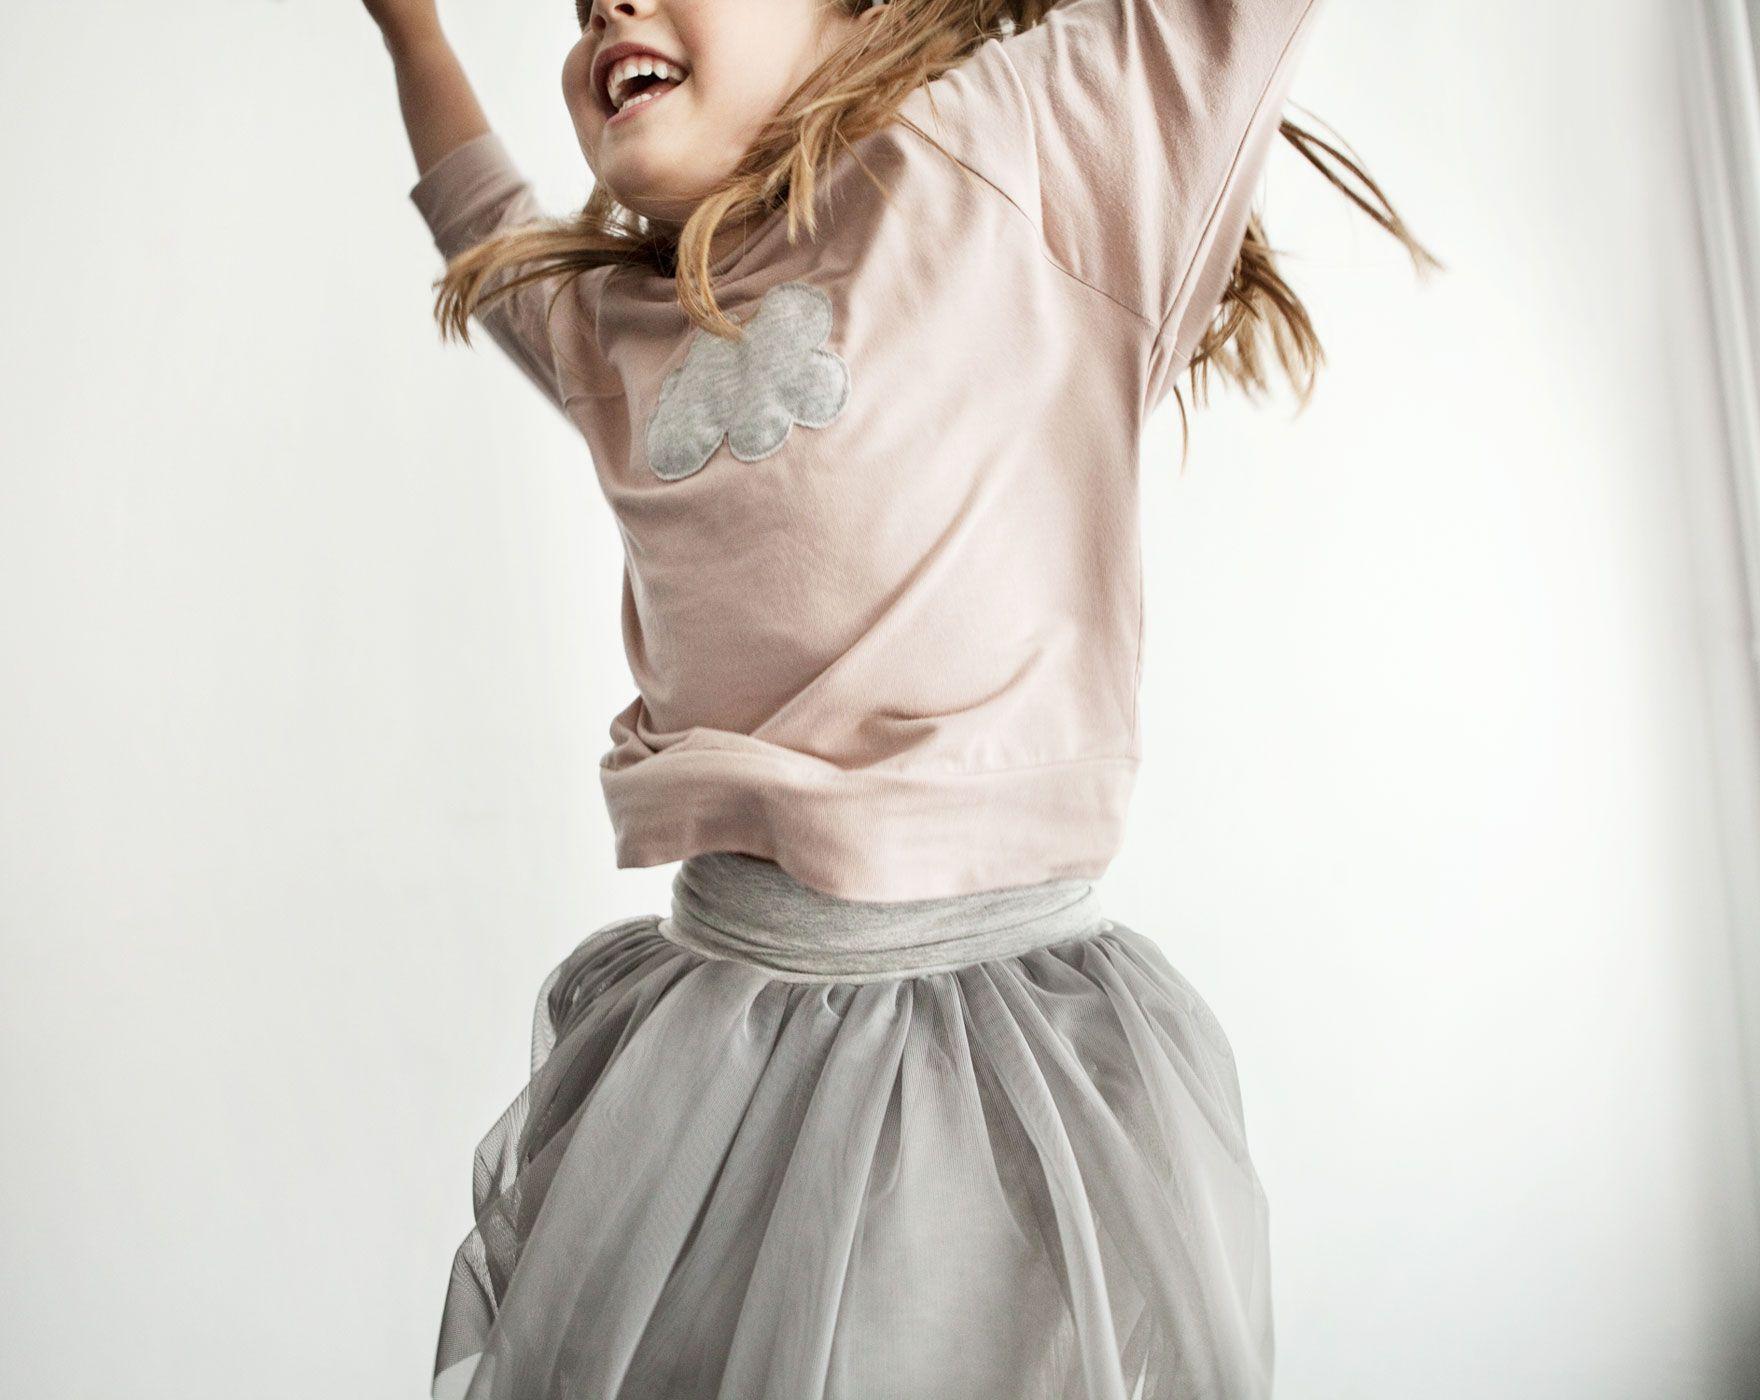 a0eda4e525 Kids On The Moon - main page Shiffon skirt for a little girl | Baby ...